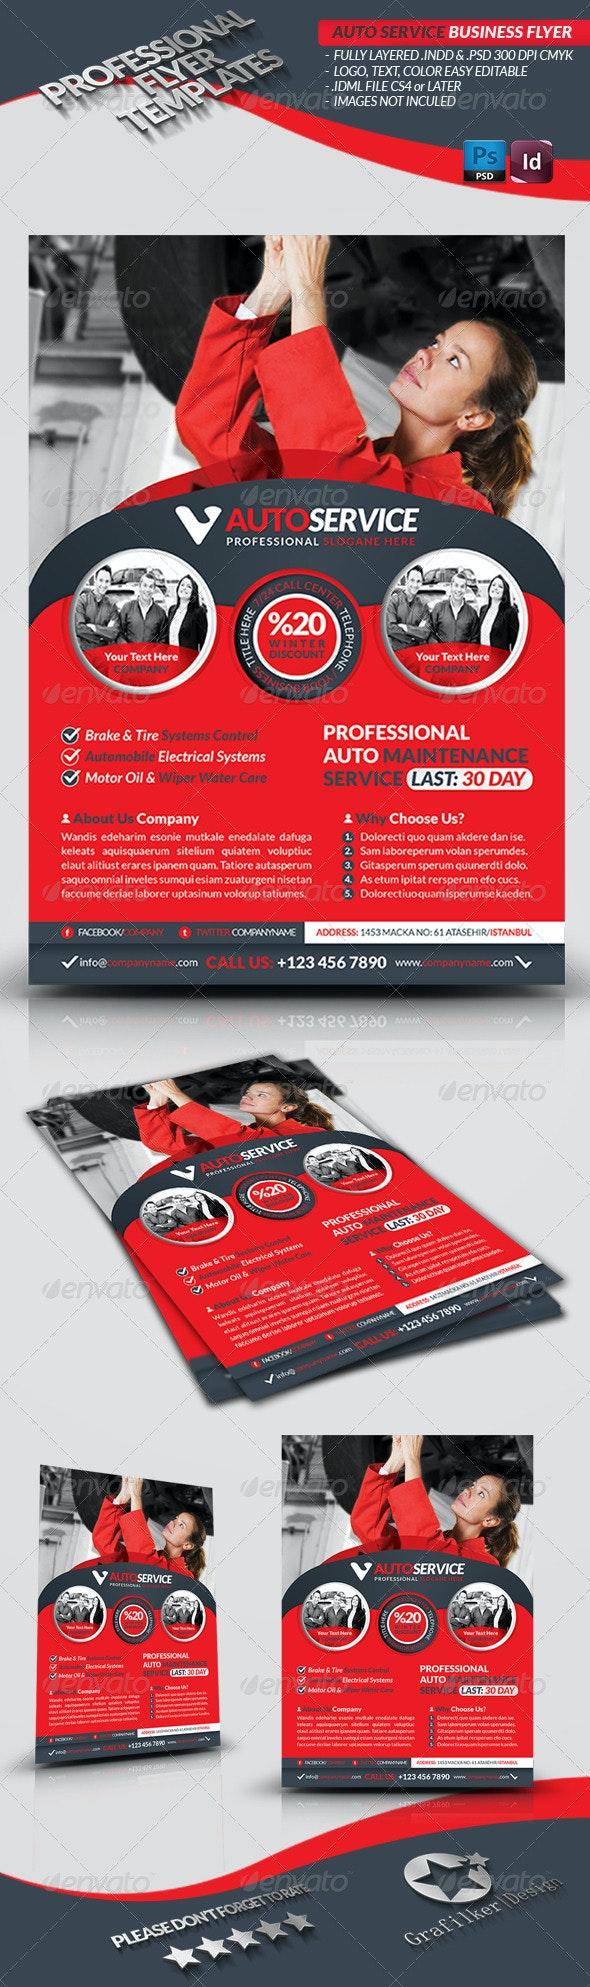 Automobile Service Business Flyer - Corporate Flyers